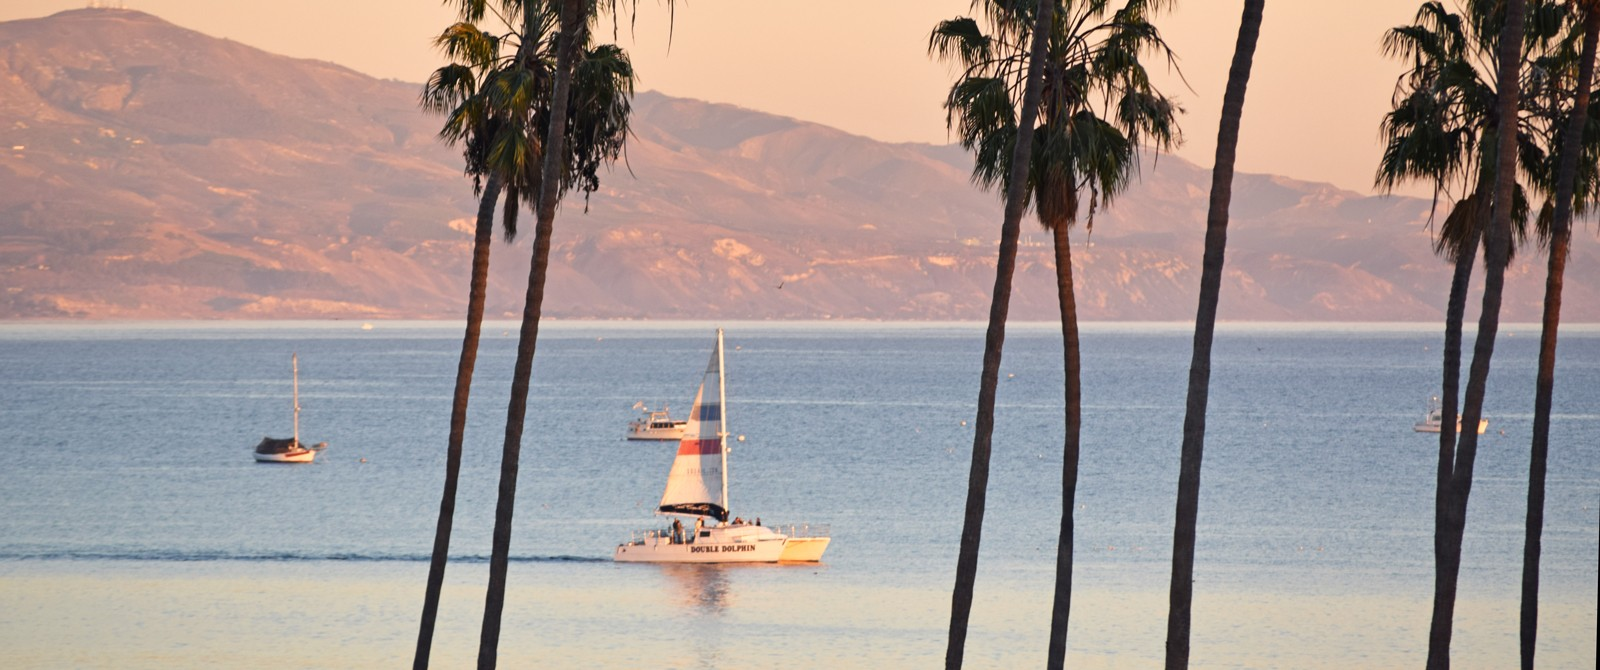 Santa Barbara Sailing on a Santa Barbara bike tour with Trek Travel